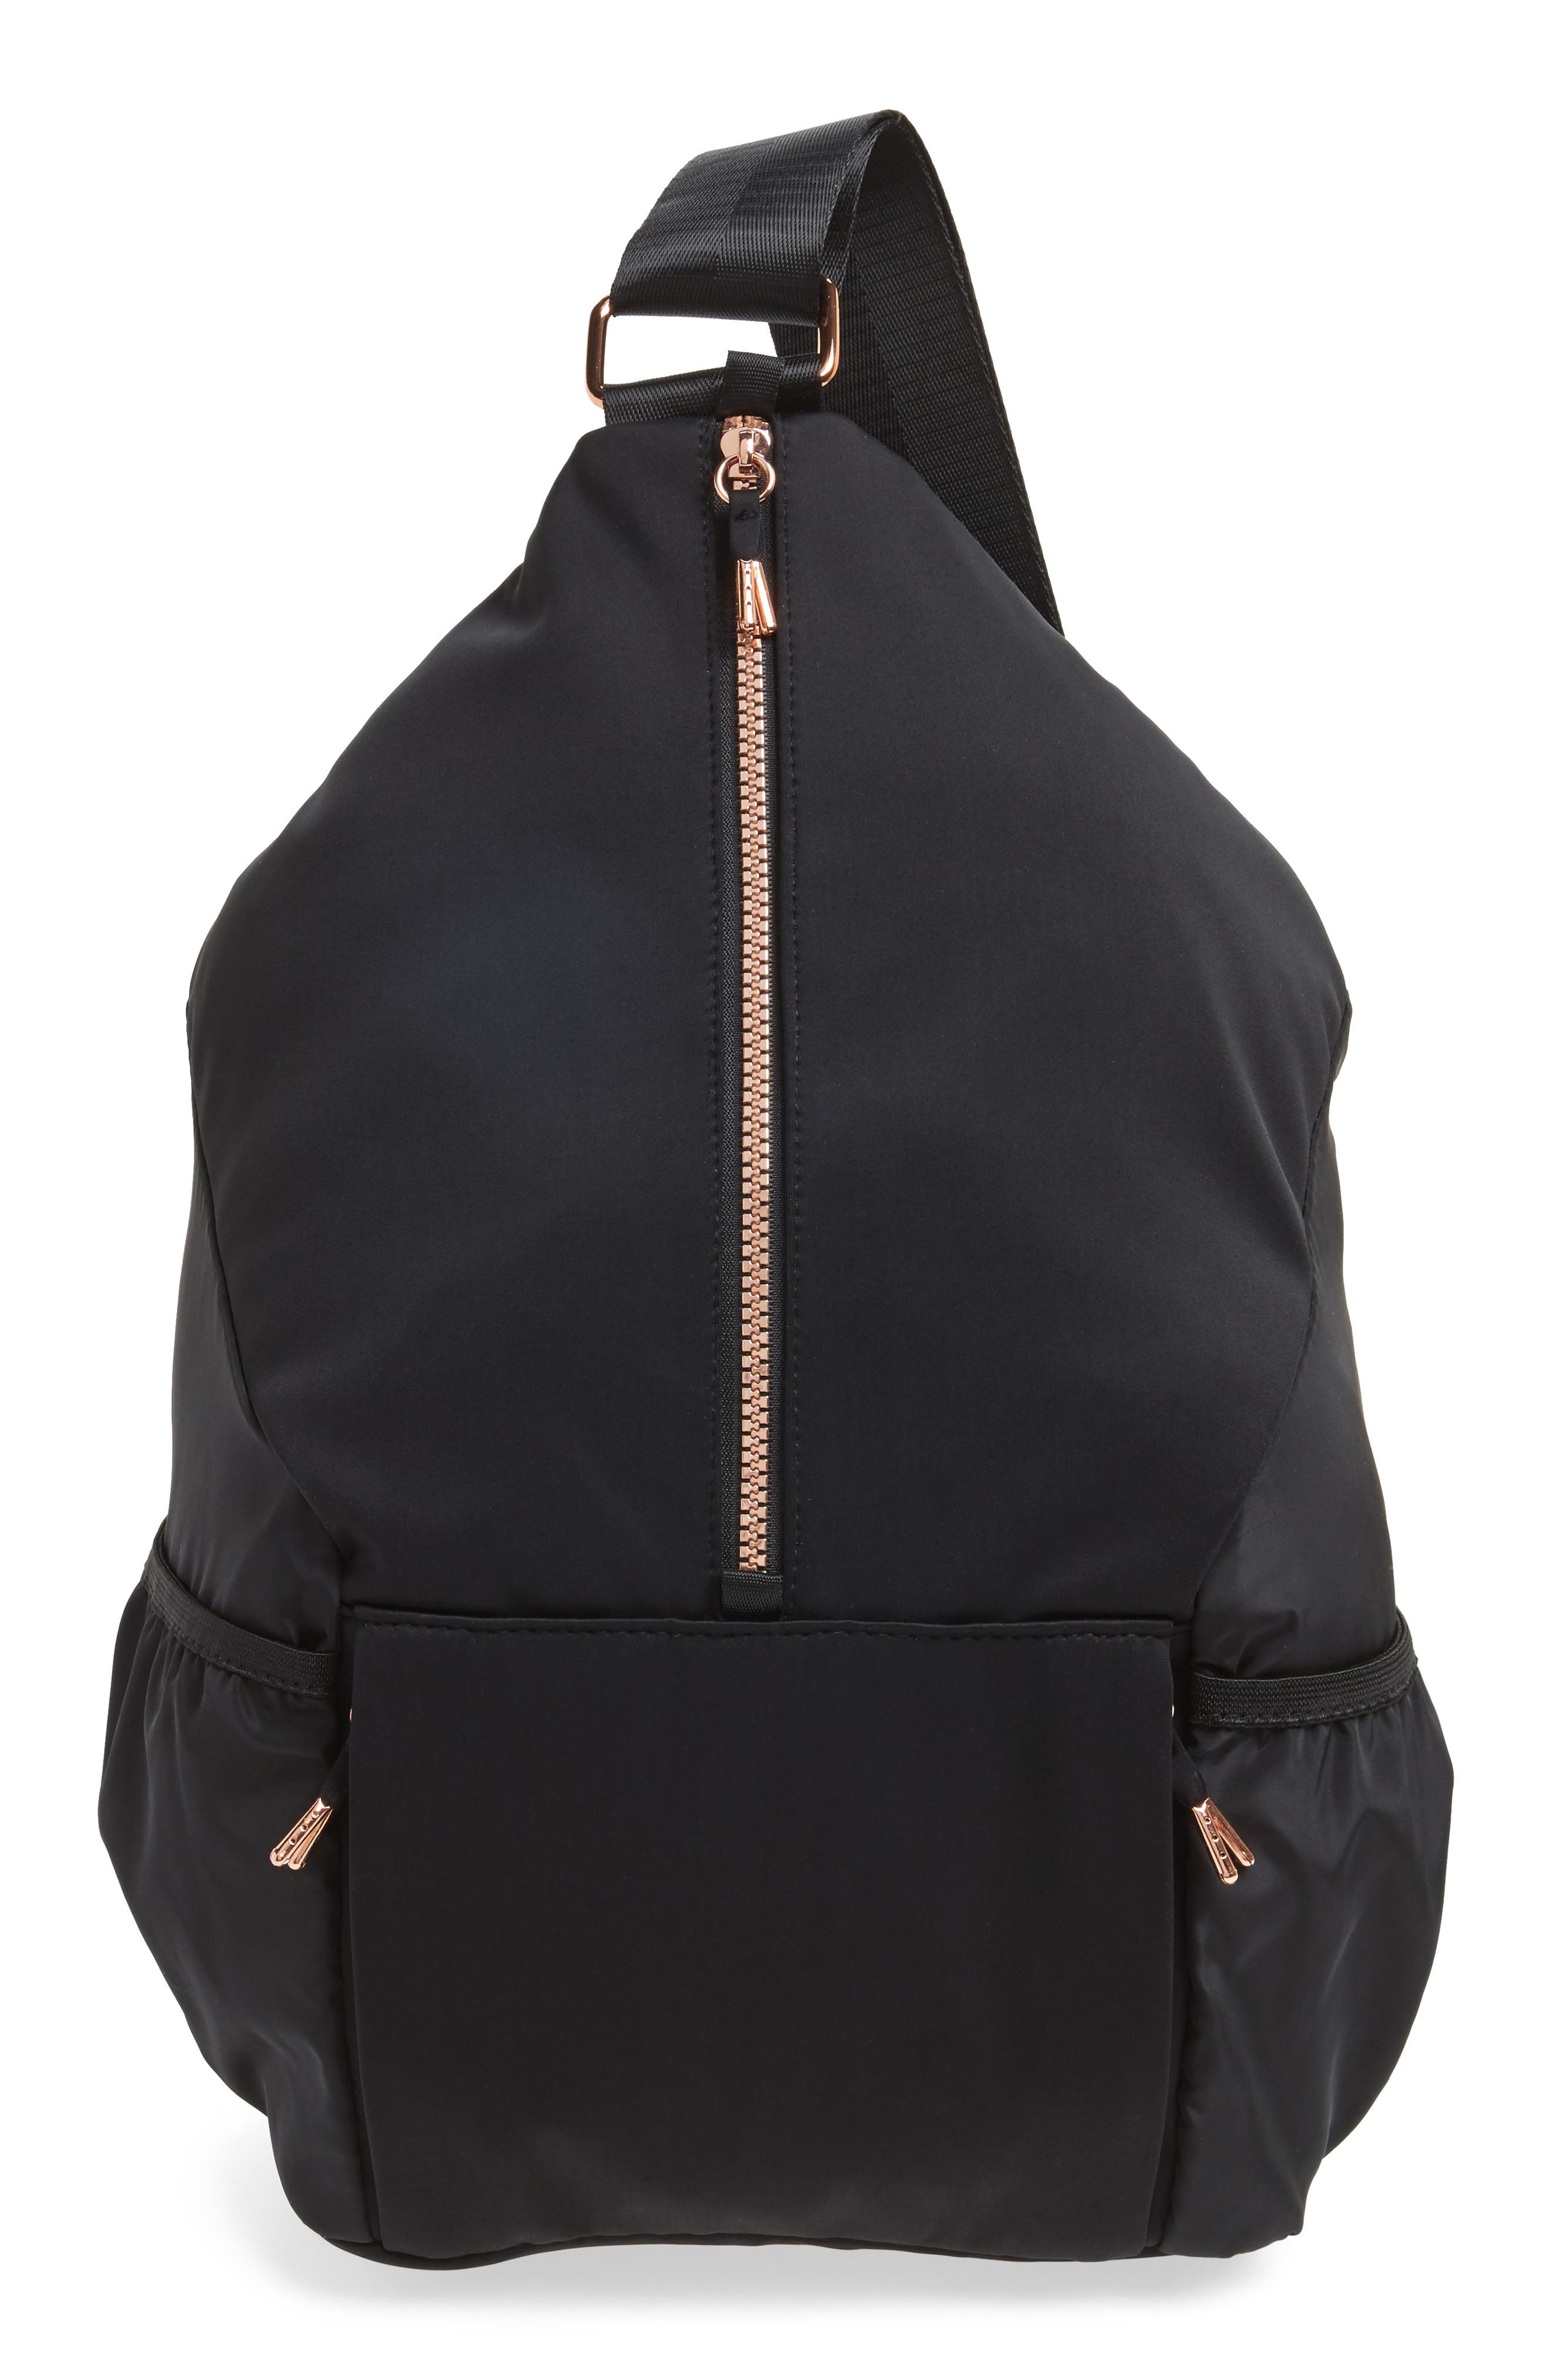 Alternate Image 1 Selected - Zella Studio Sling Backpack